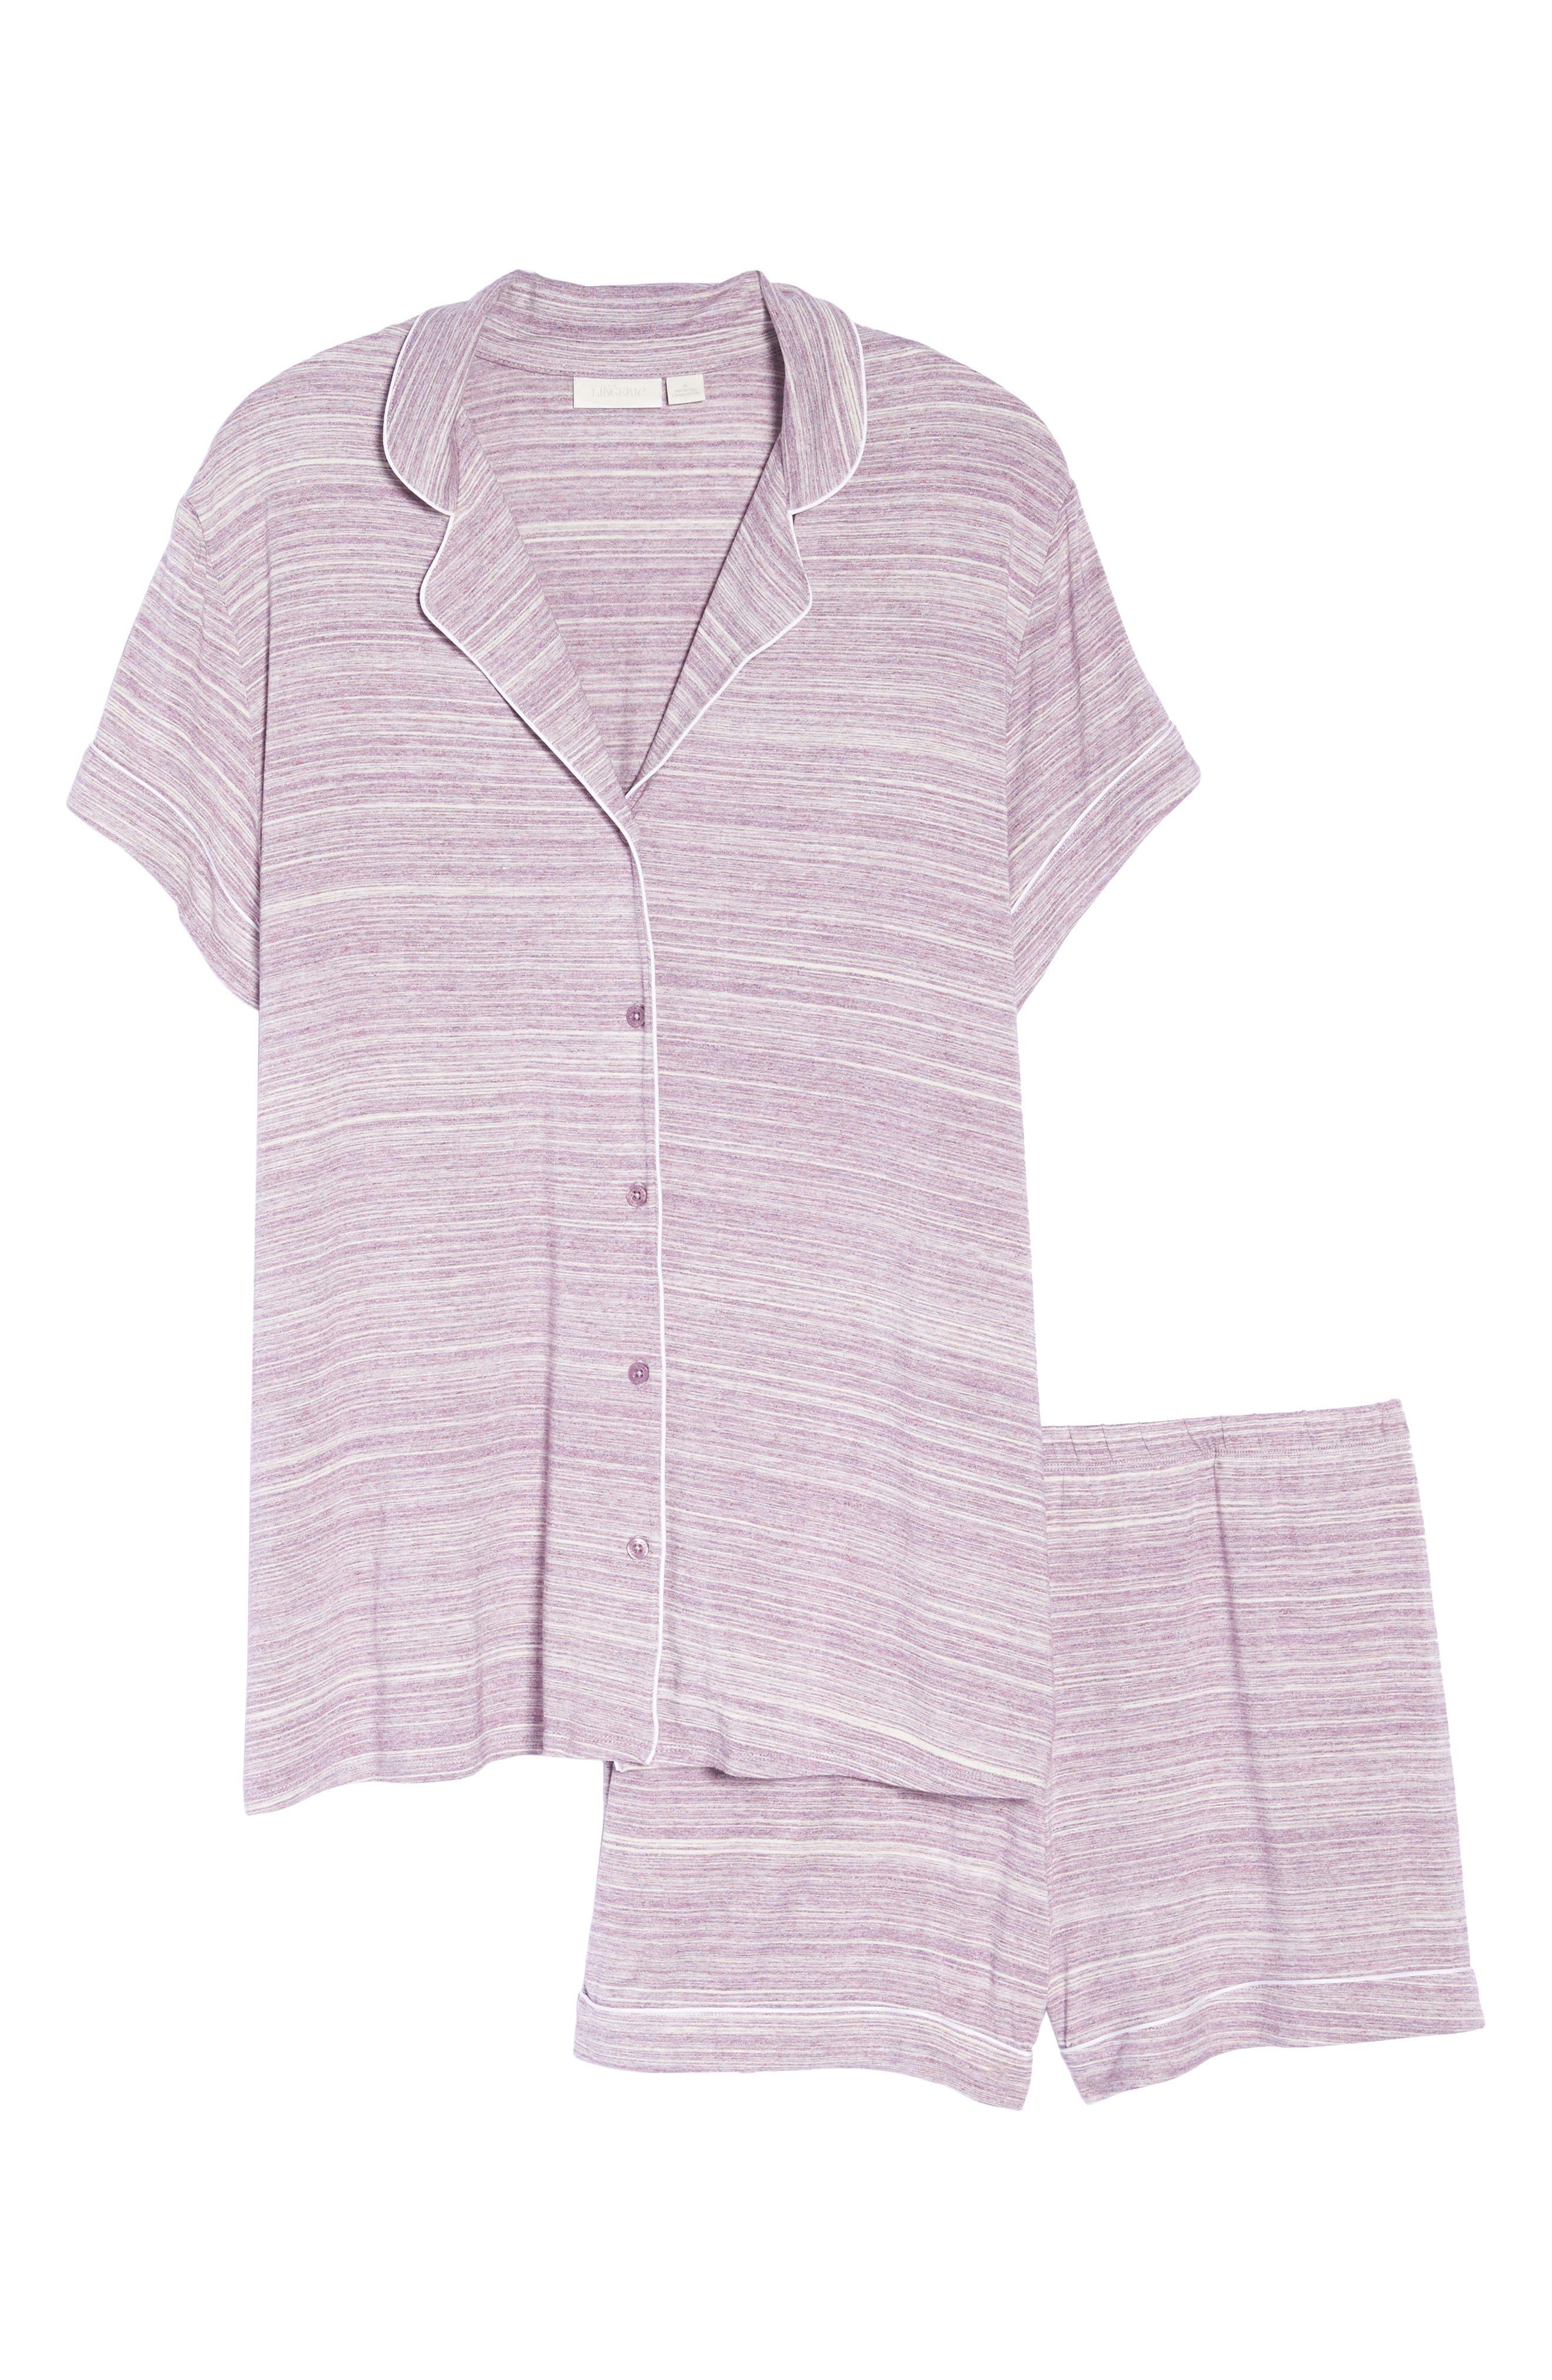 'Moonlight' Short Pajamas,                             Alternate thumbnail 6, color,                             Purple Spacedye